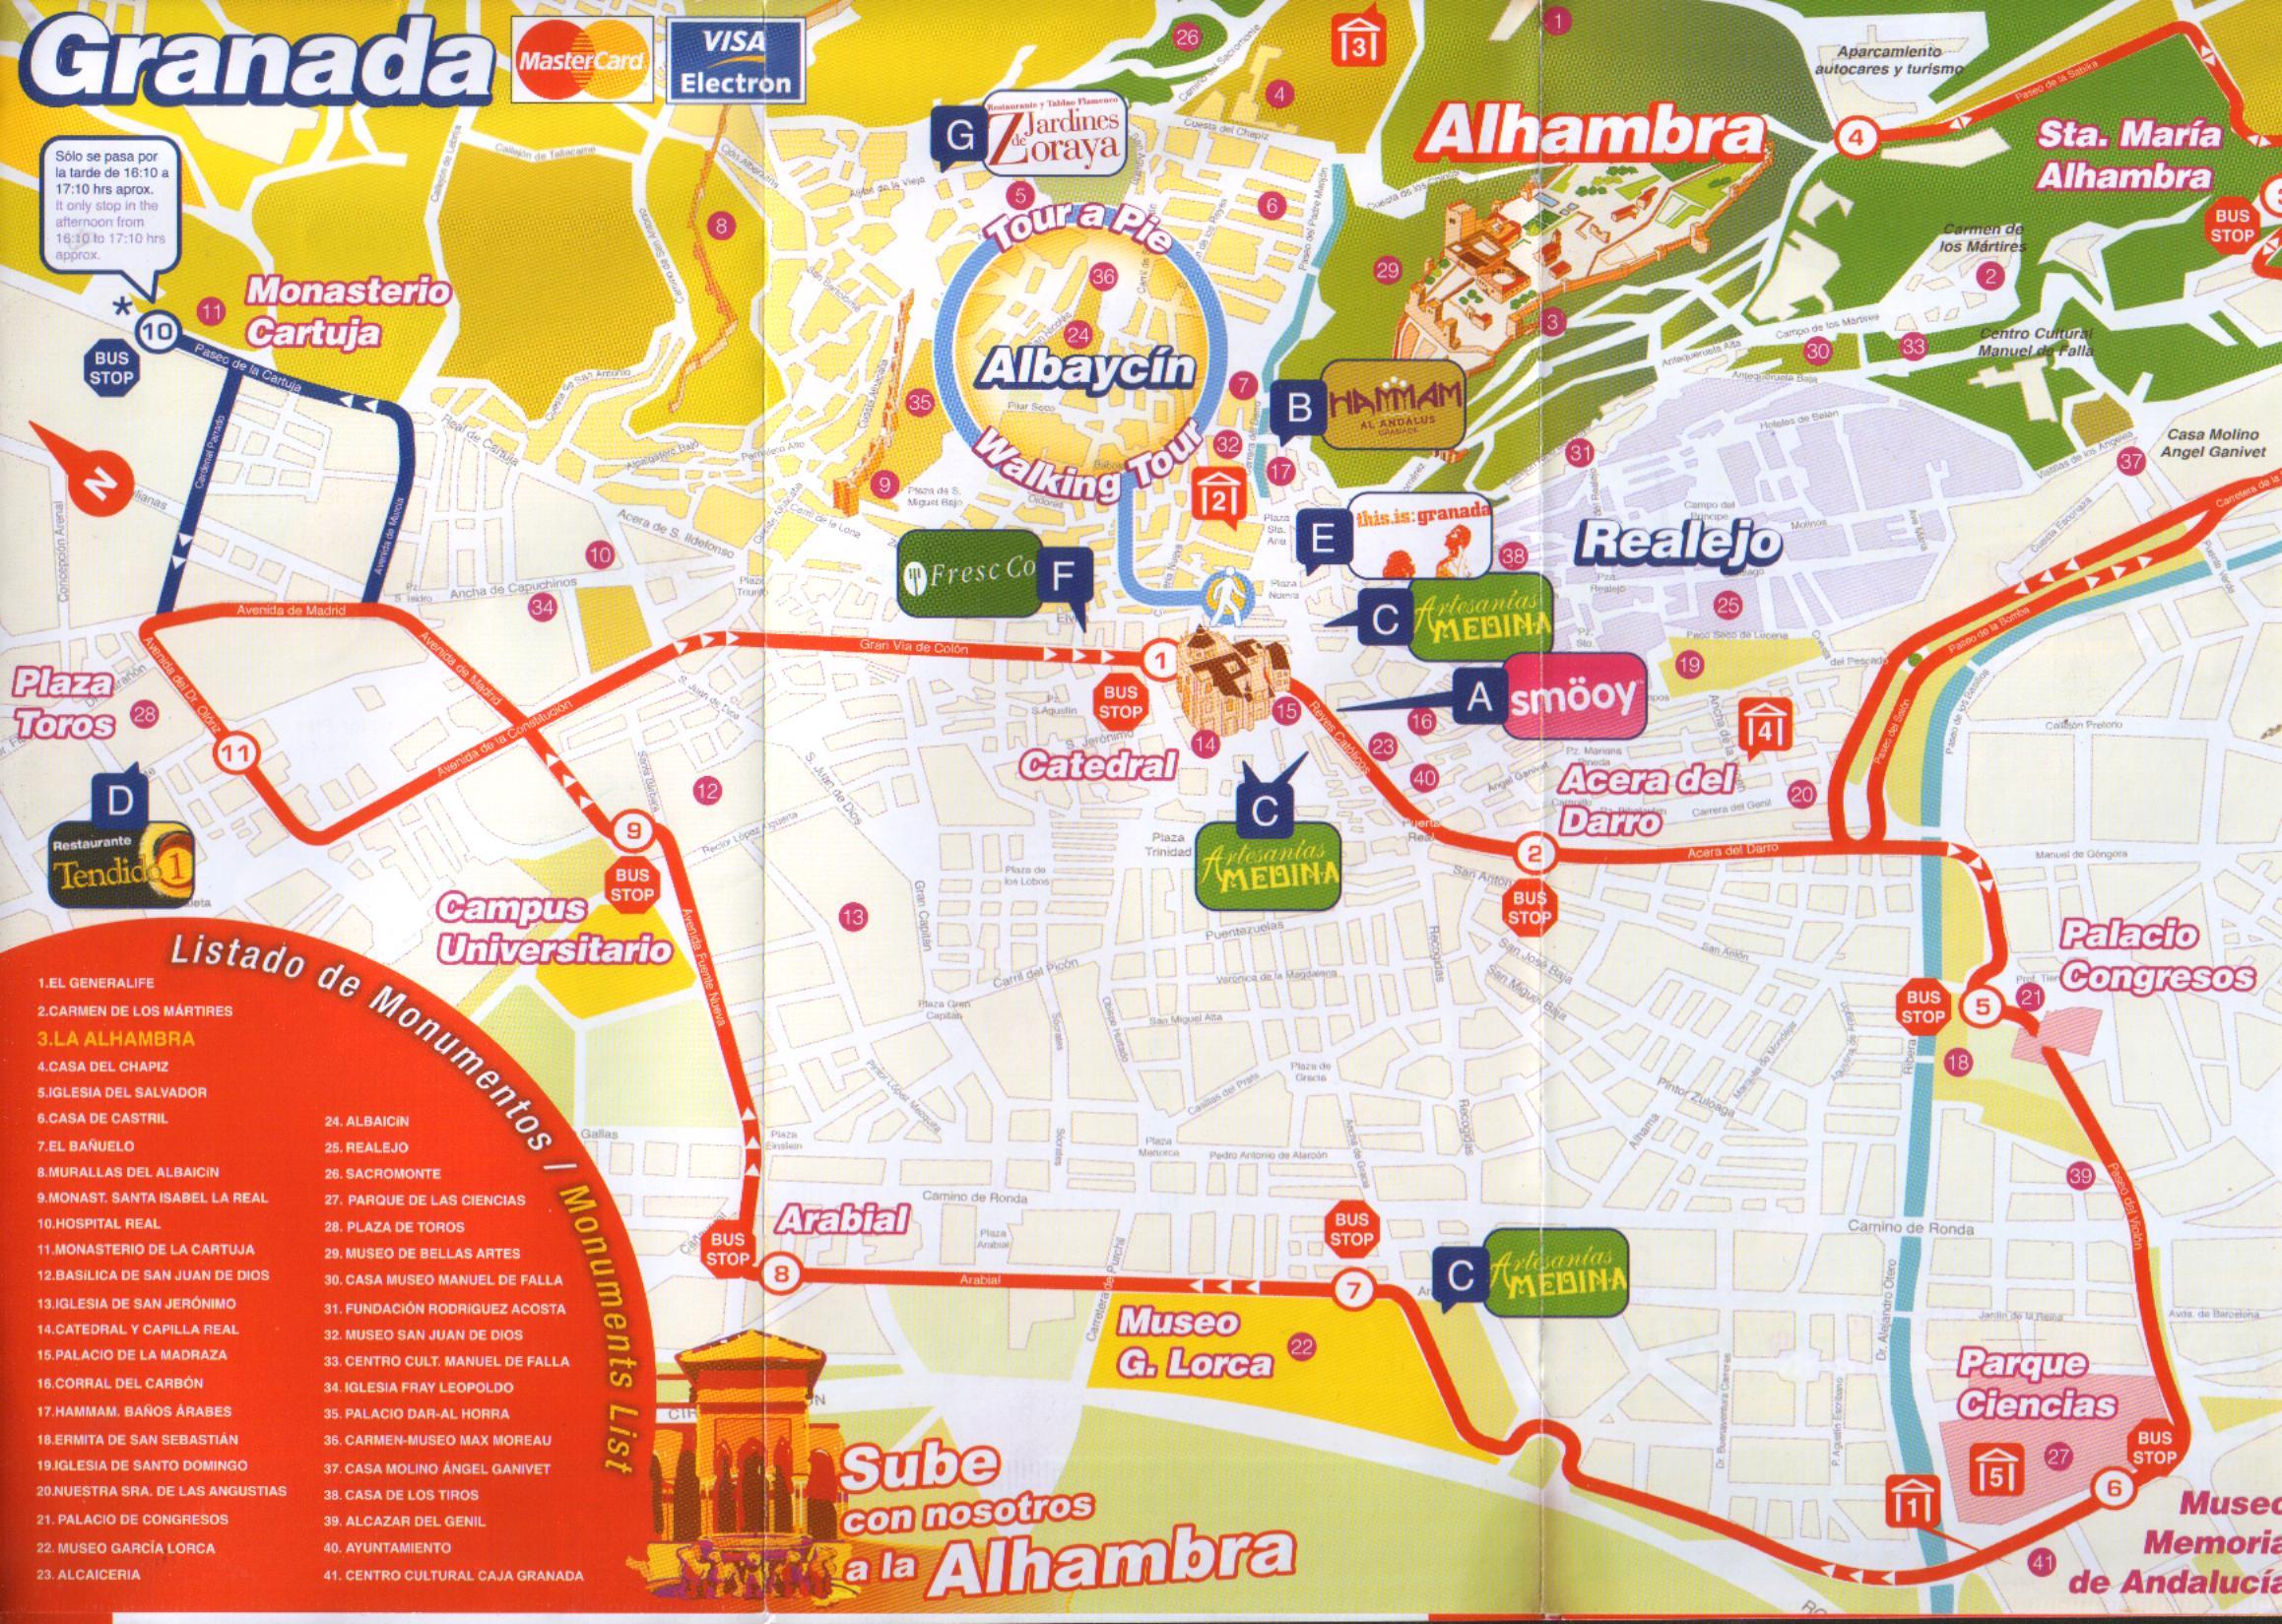 гранада испания на карте люди, которых